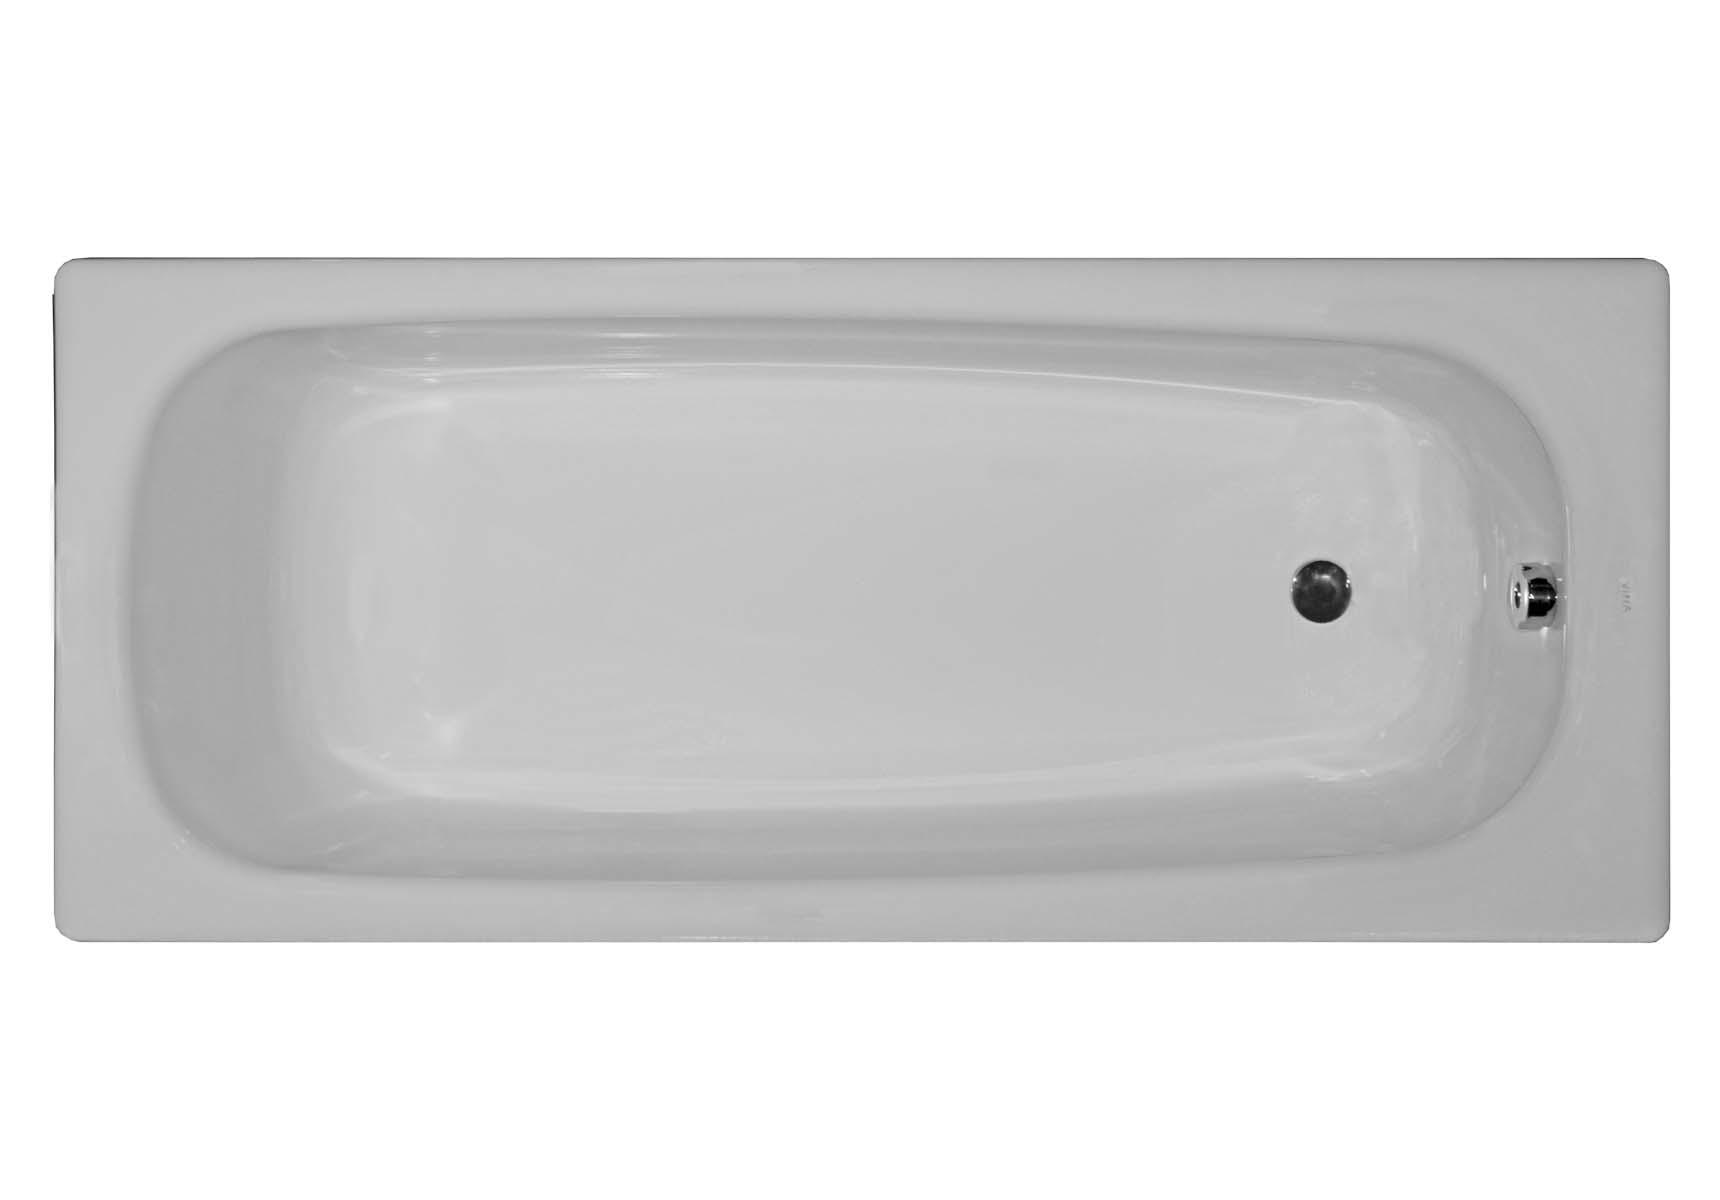 Generic 150x70 cm Steel Bathtub, 2.2 Mm, Low Depth